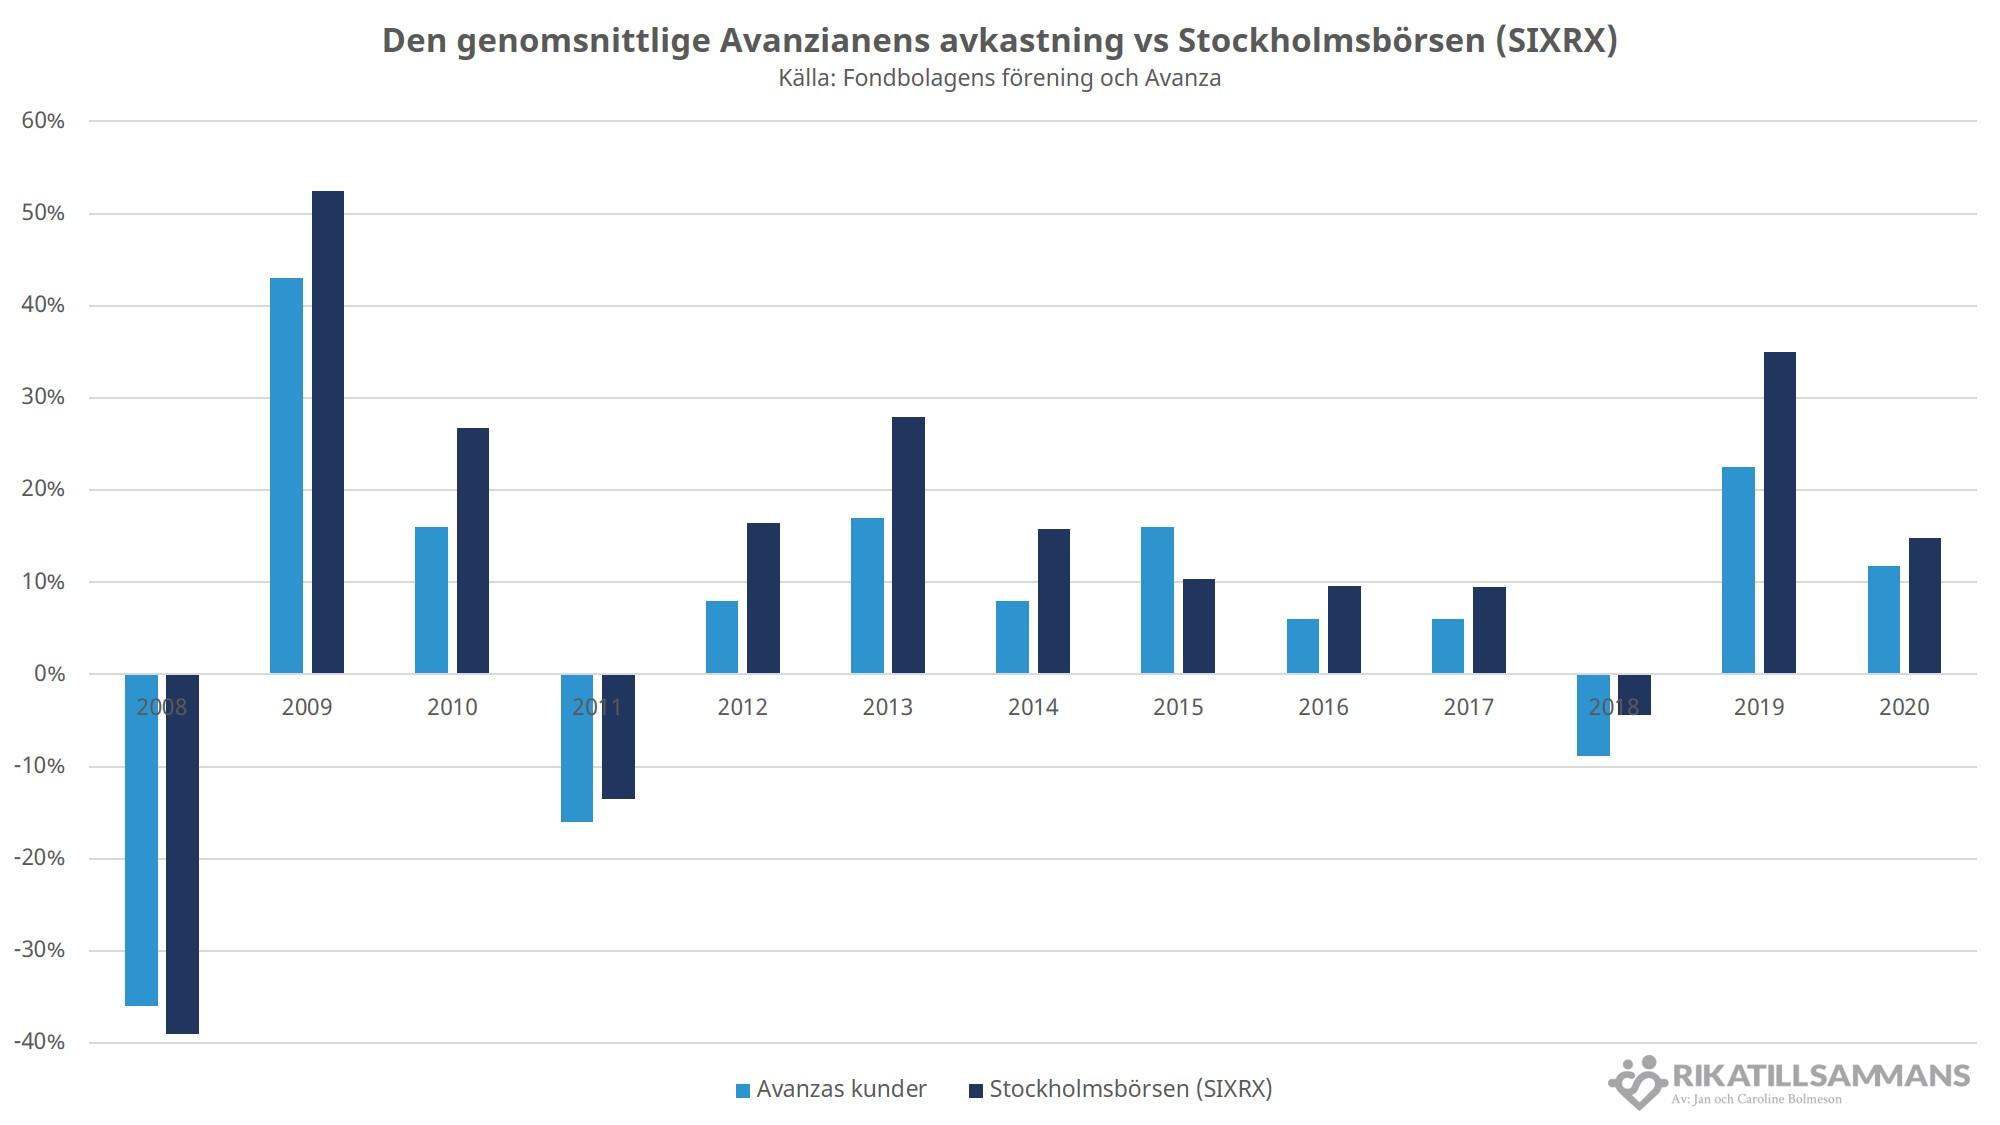 Genomsnittlige avanzianen vs Stockholmsbörsen (SIXRX)